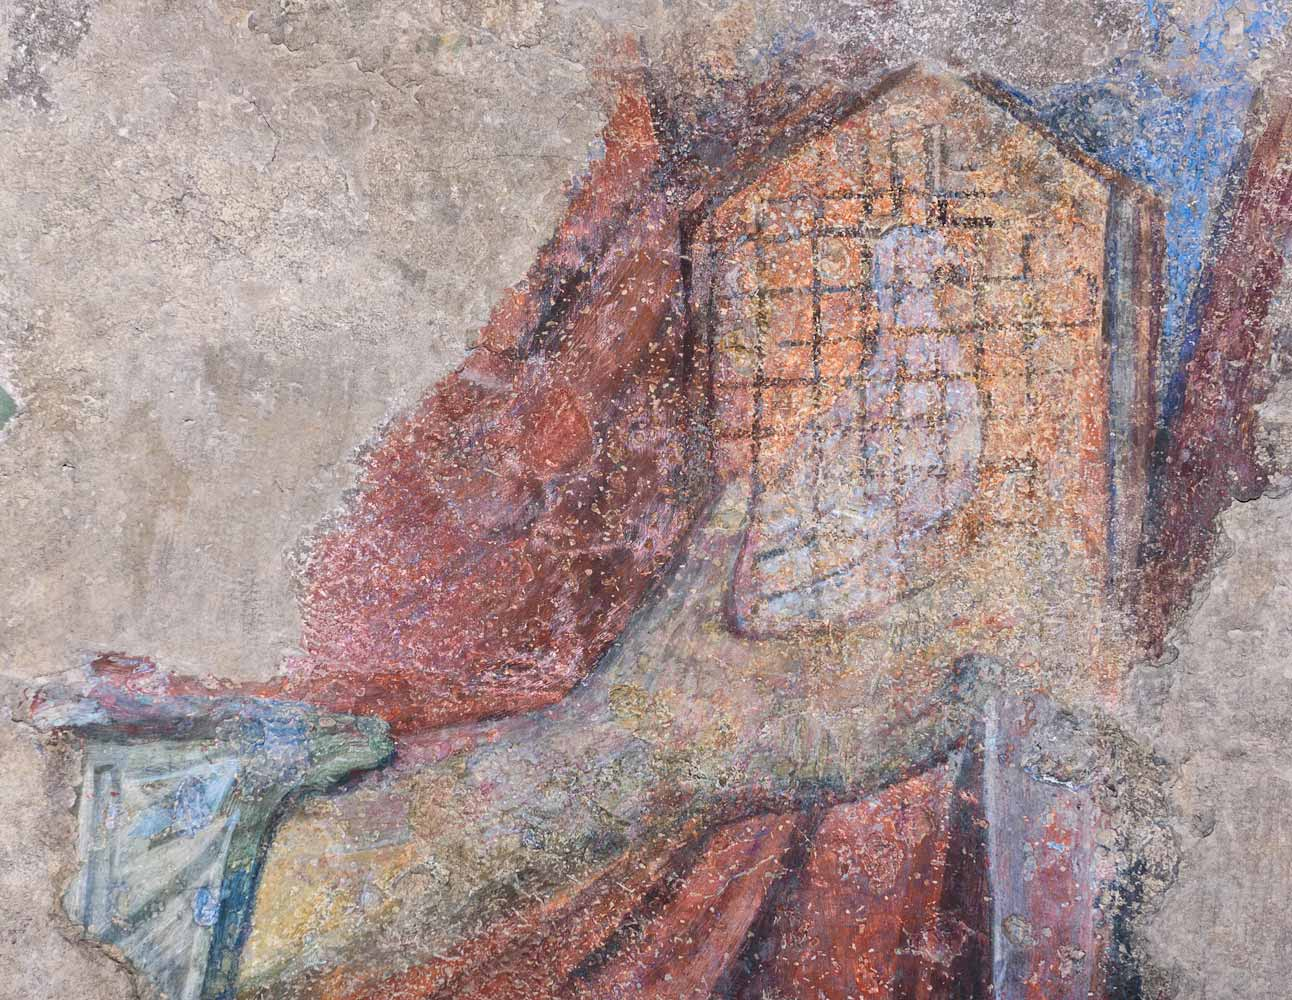 monastere-abu-gosh-presentation-au-temple